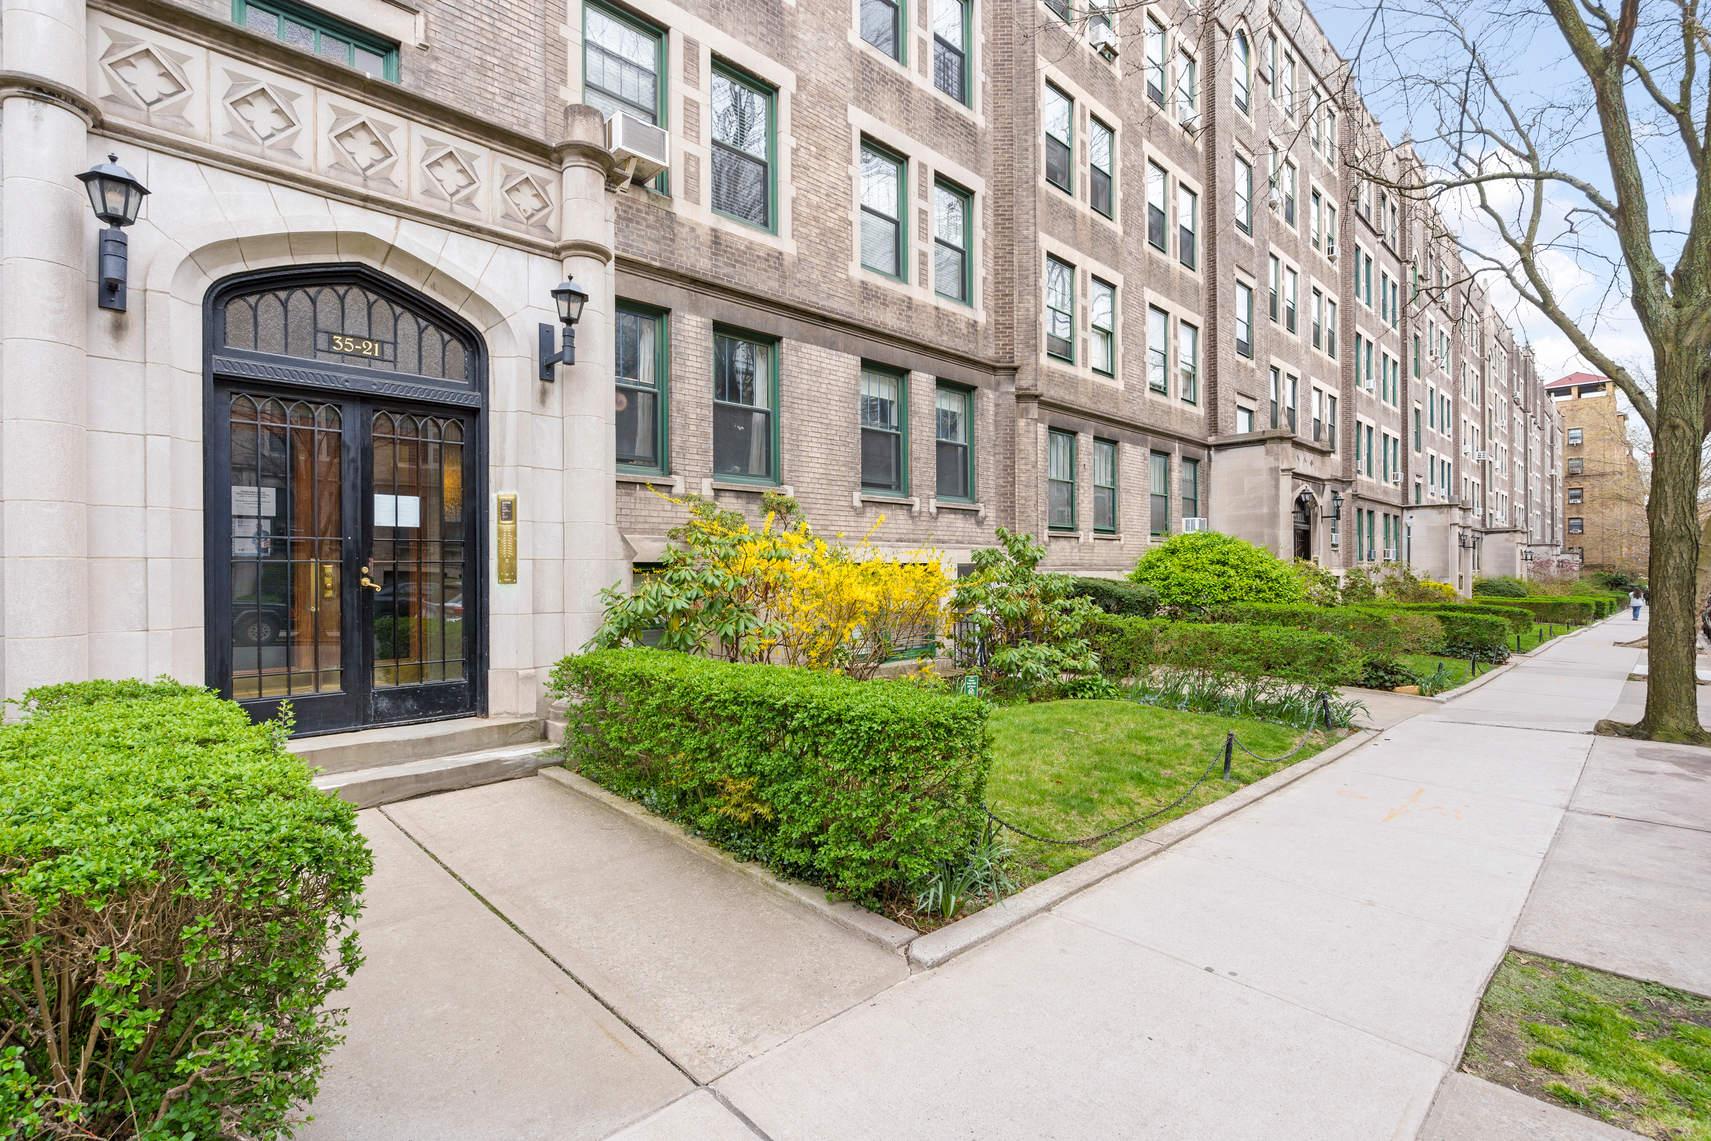 35-21 80th Street, Unit 32 photo